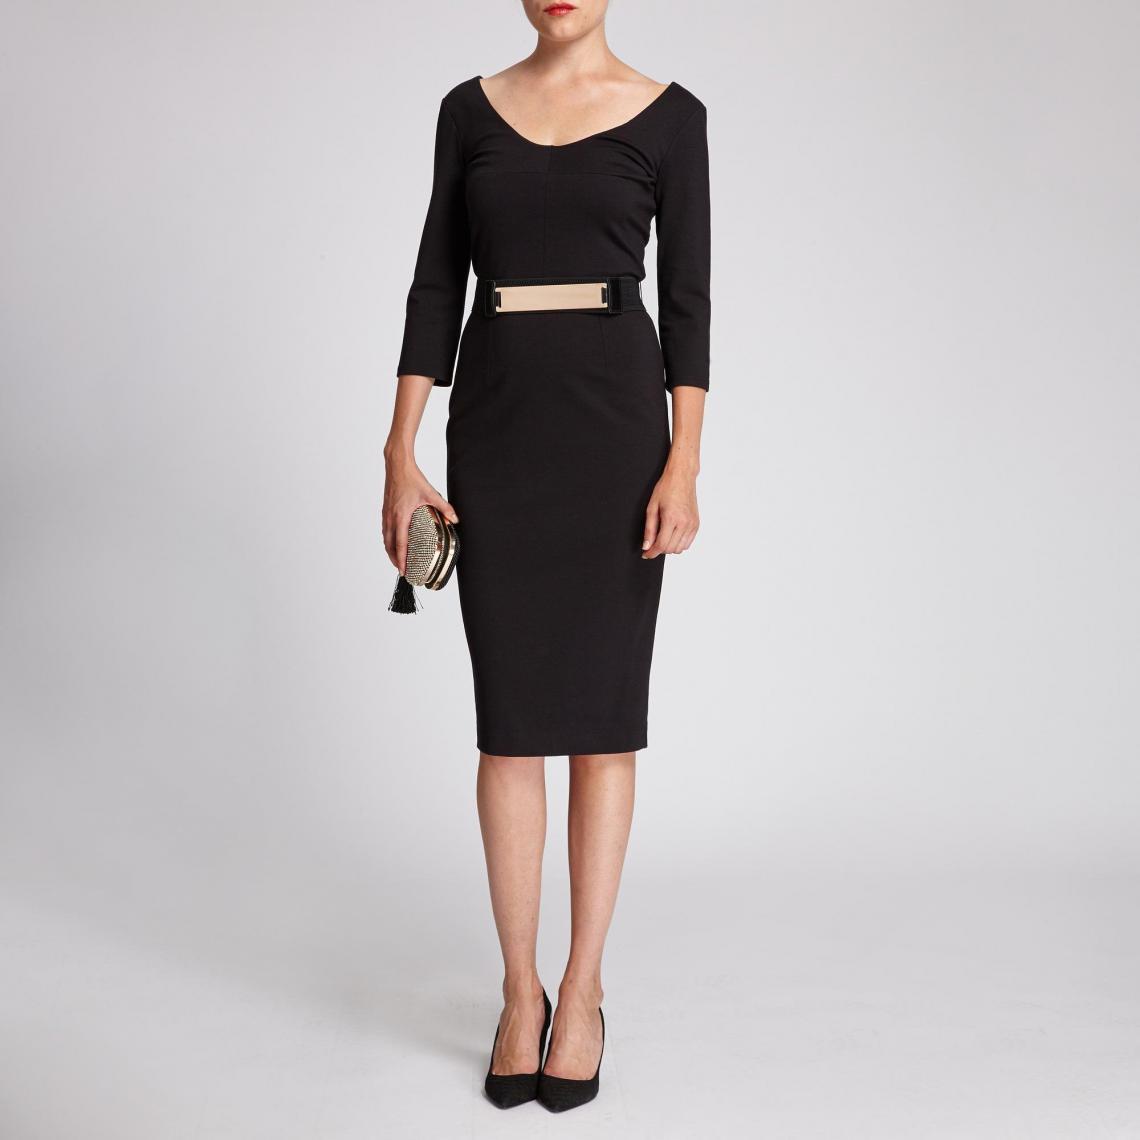 c0acdda53a1 Robe fourreau plaque dorée - Noir Morgan Femme